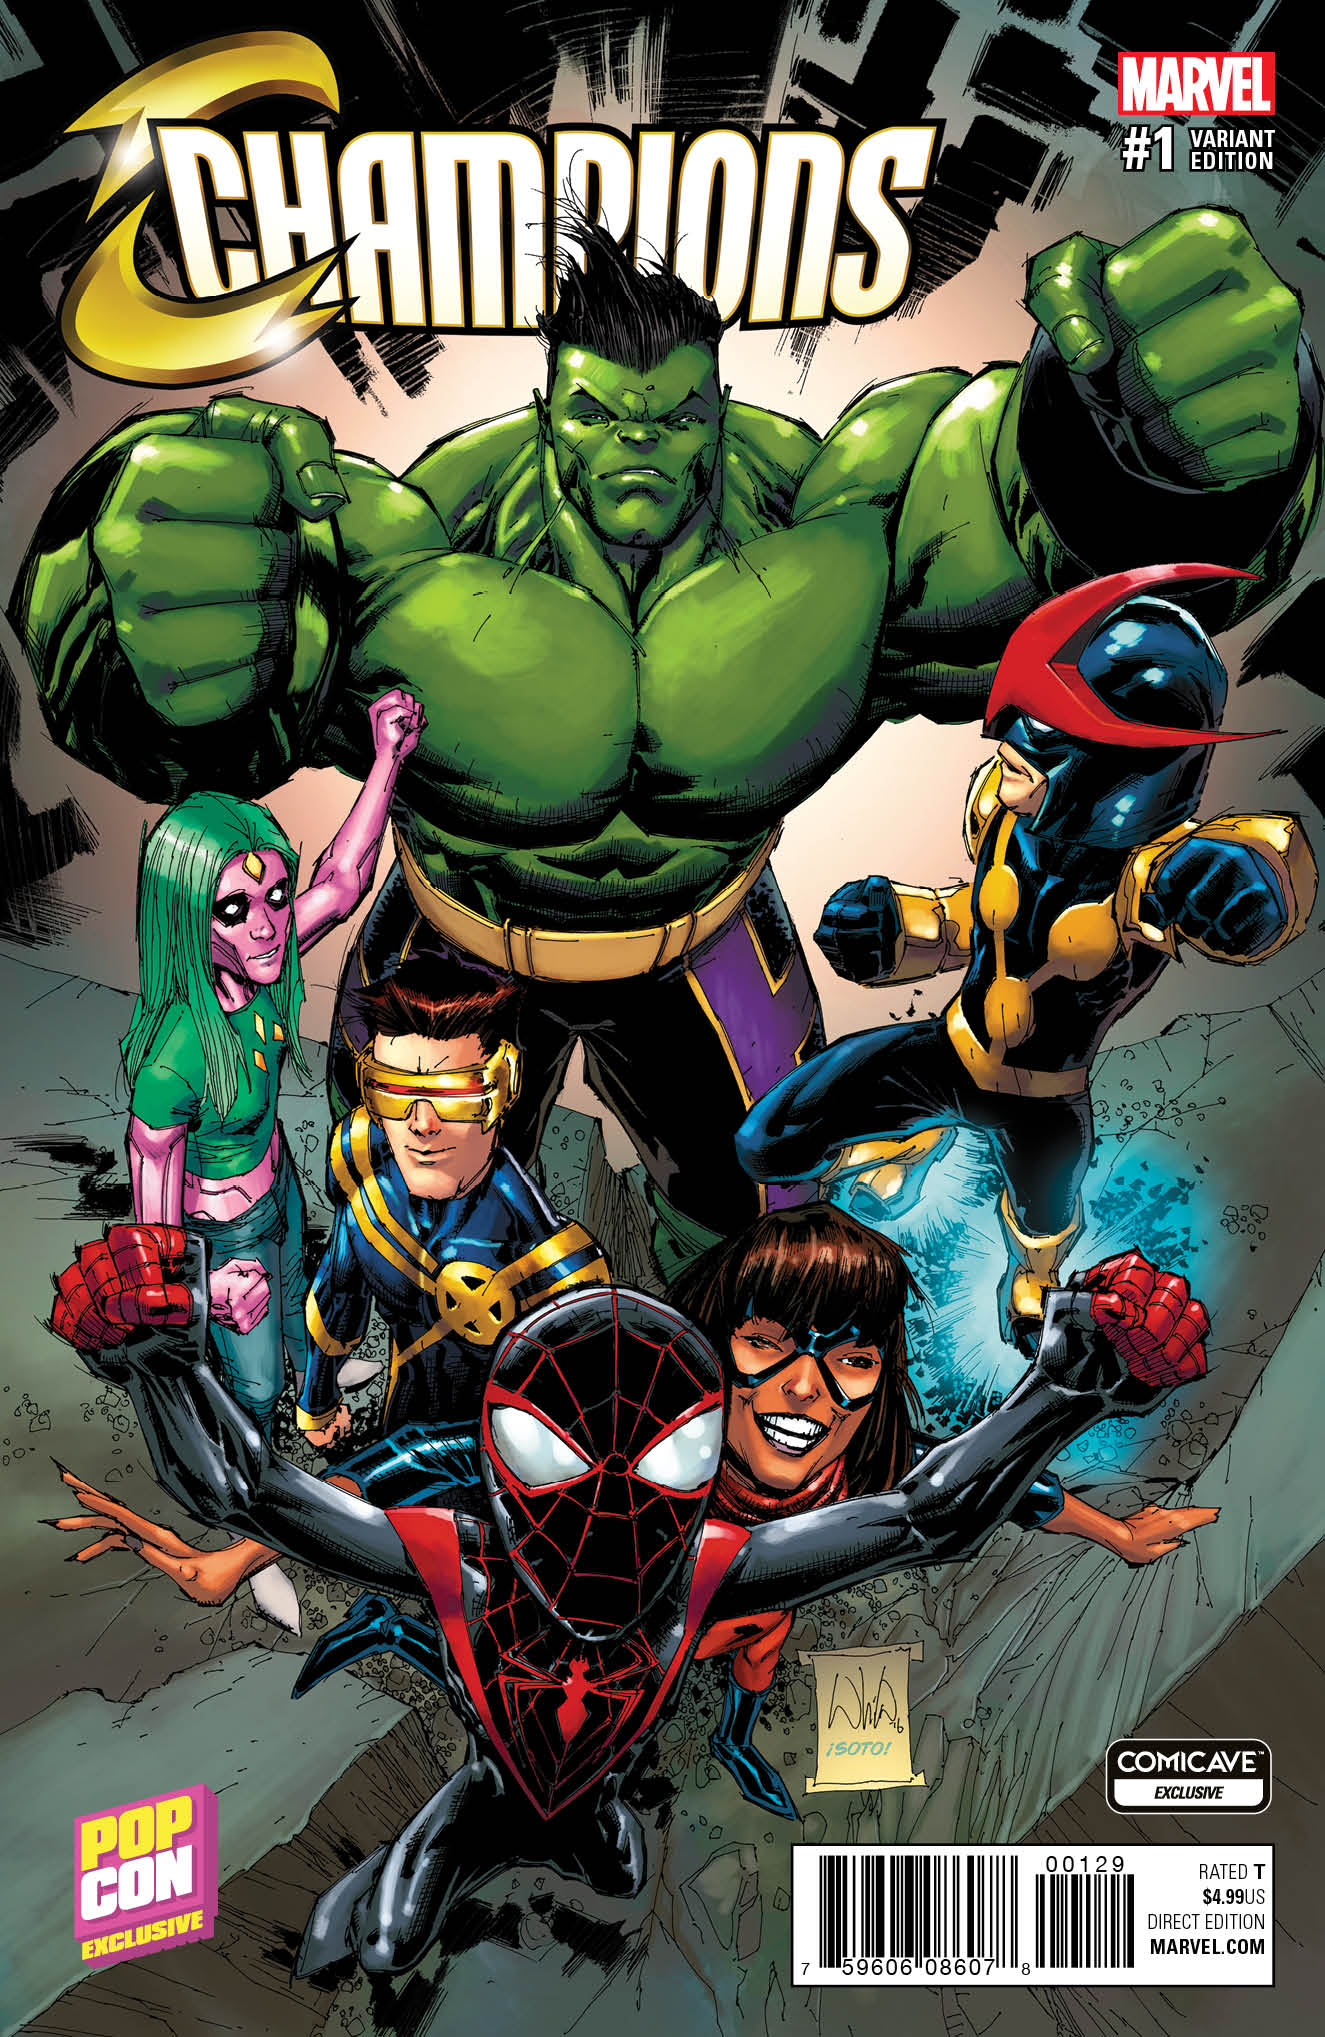 Champions Vol 2 1 Comicave Exclusive Variant.jpg